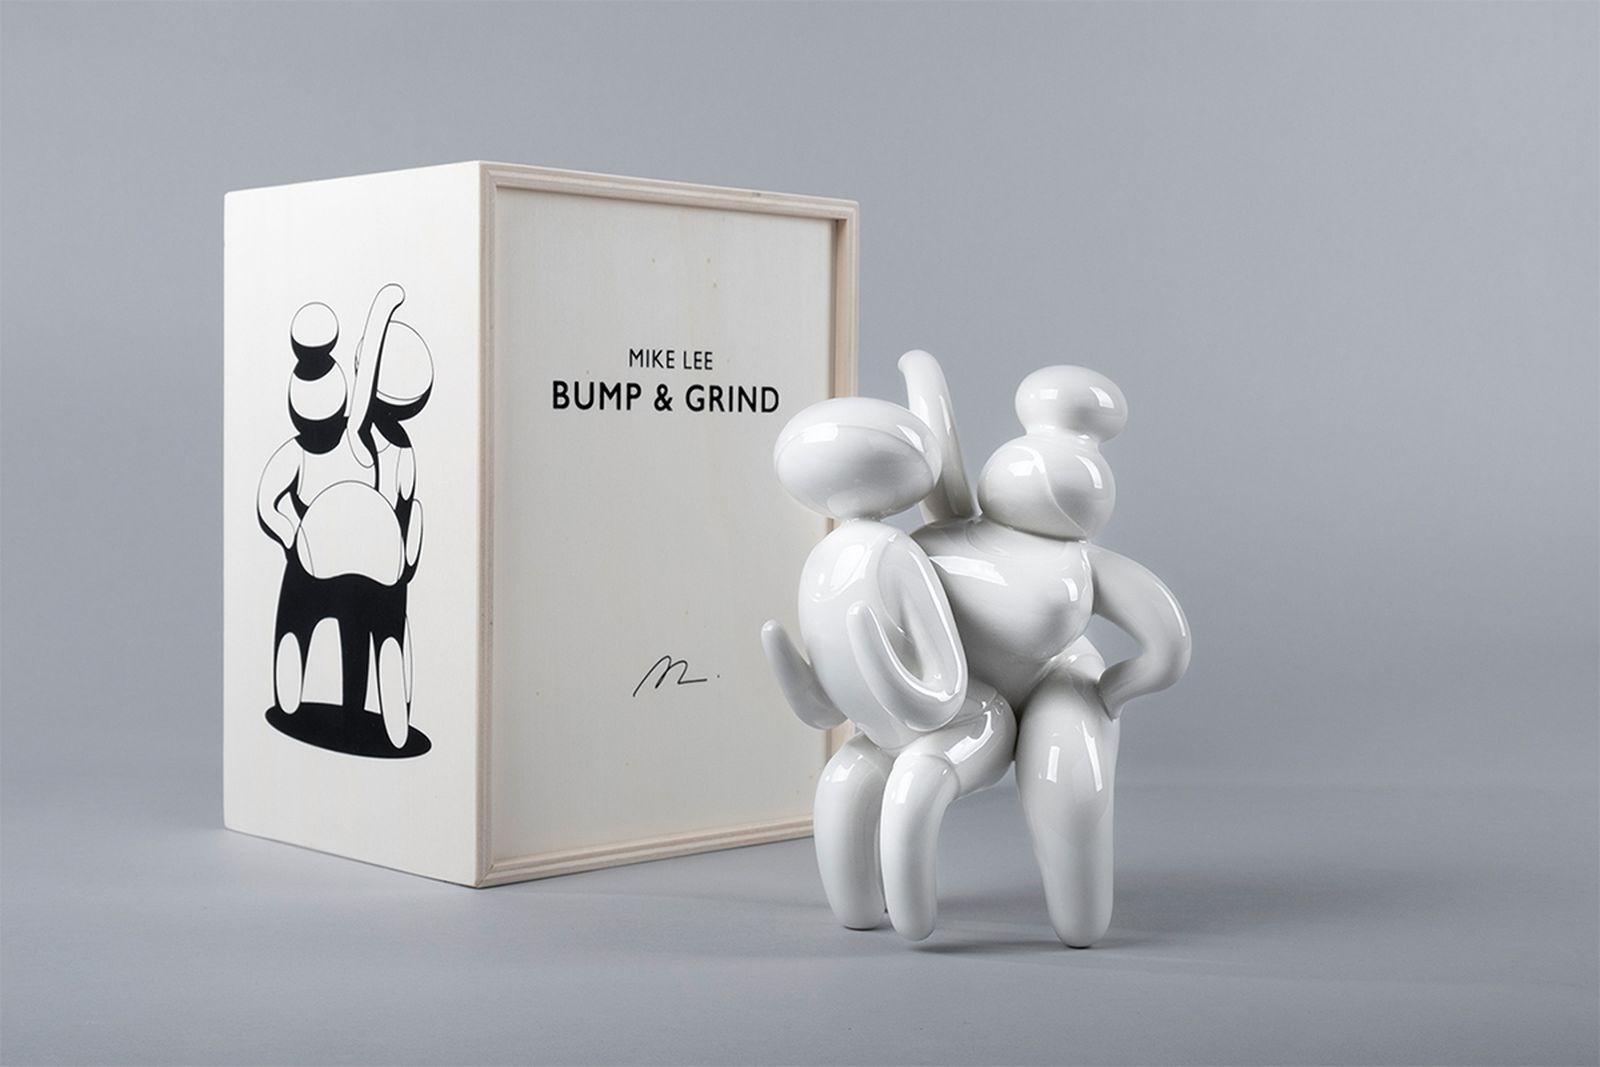 mike lee case studyo bump grind sculpture